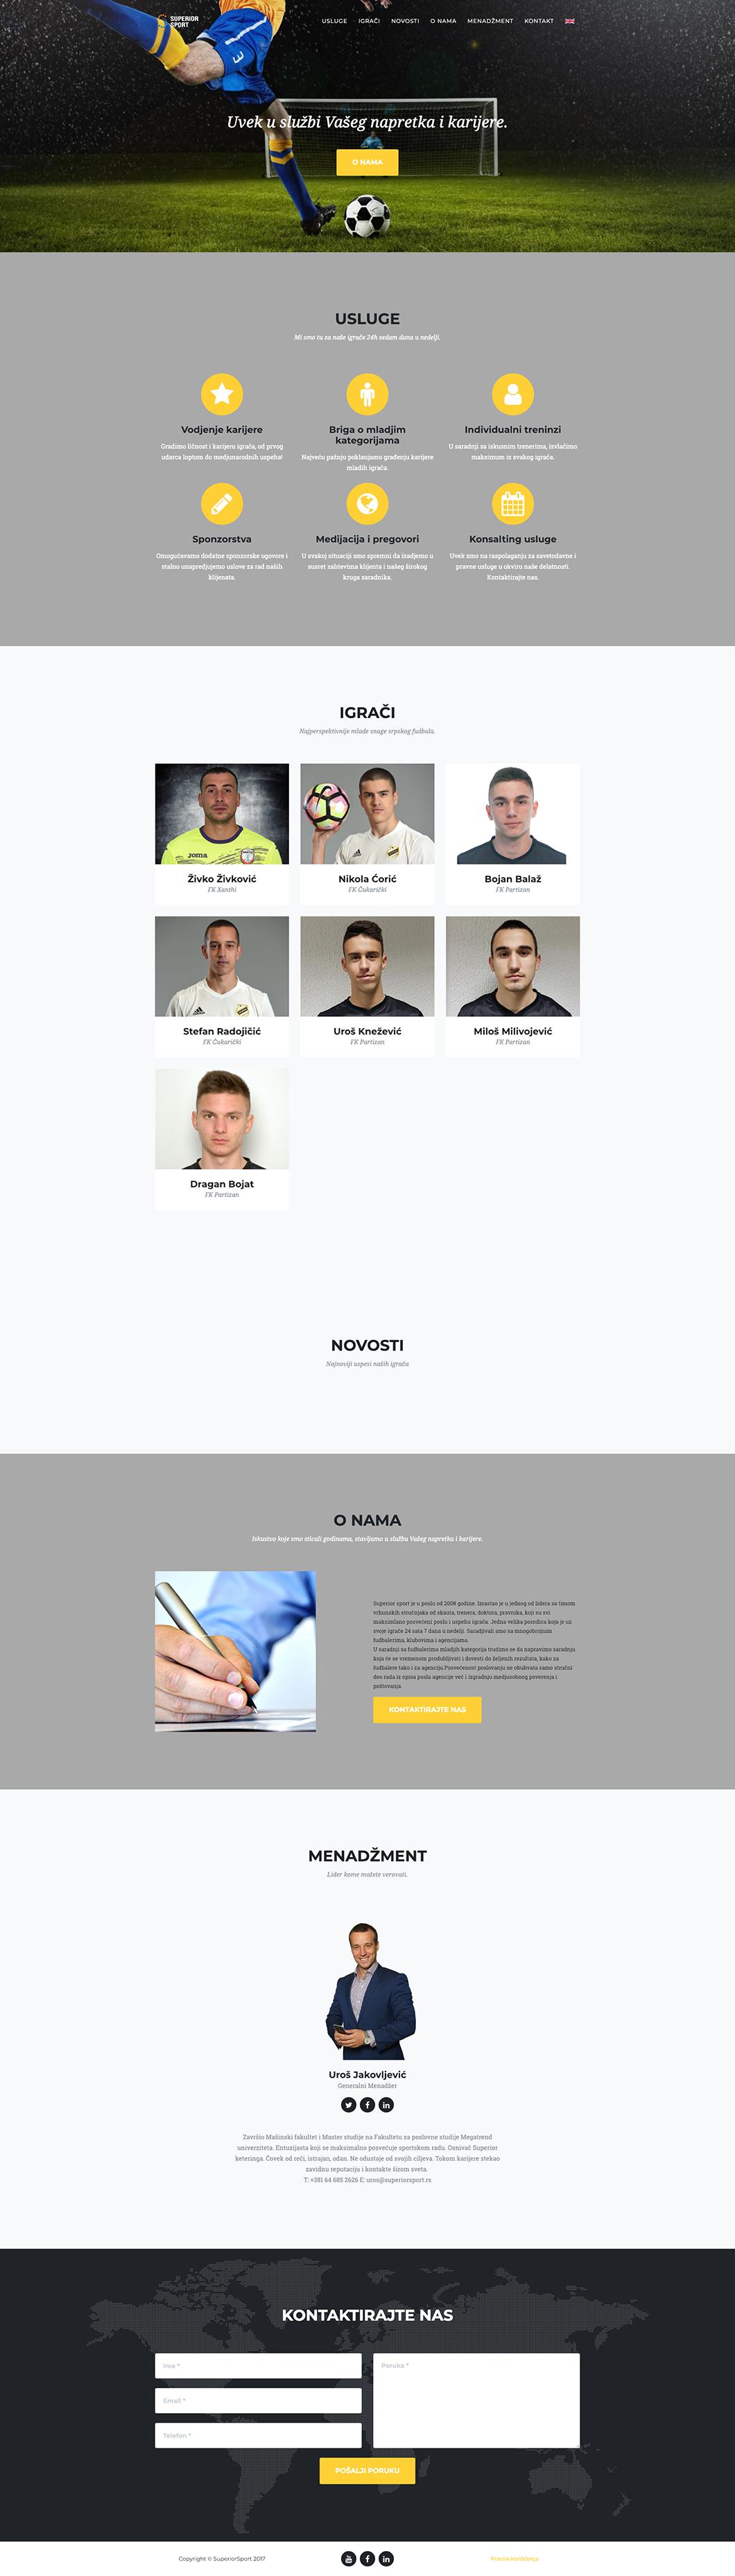 screencapture-superiorsport-rs-2019-01-04-10_42_23